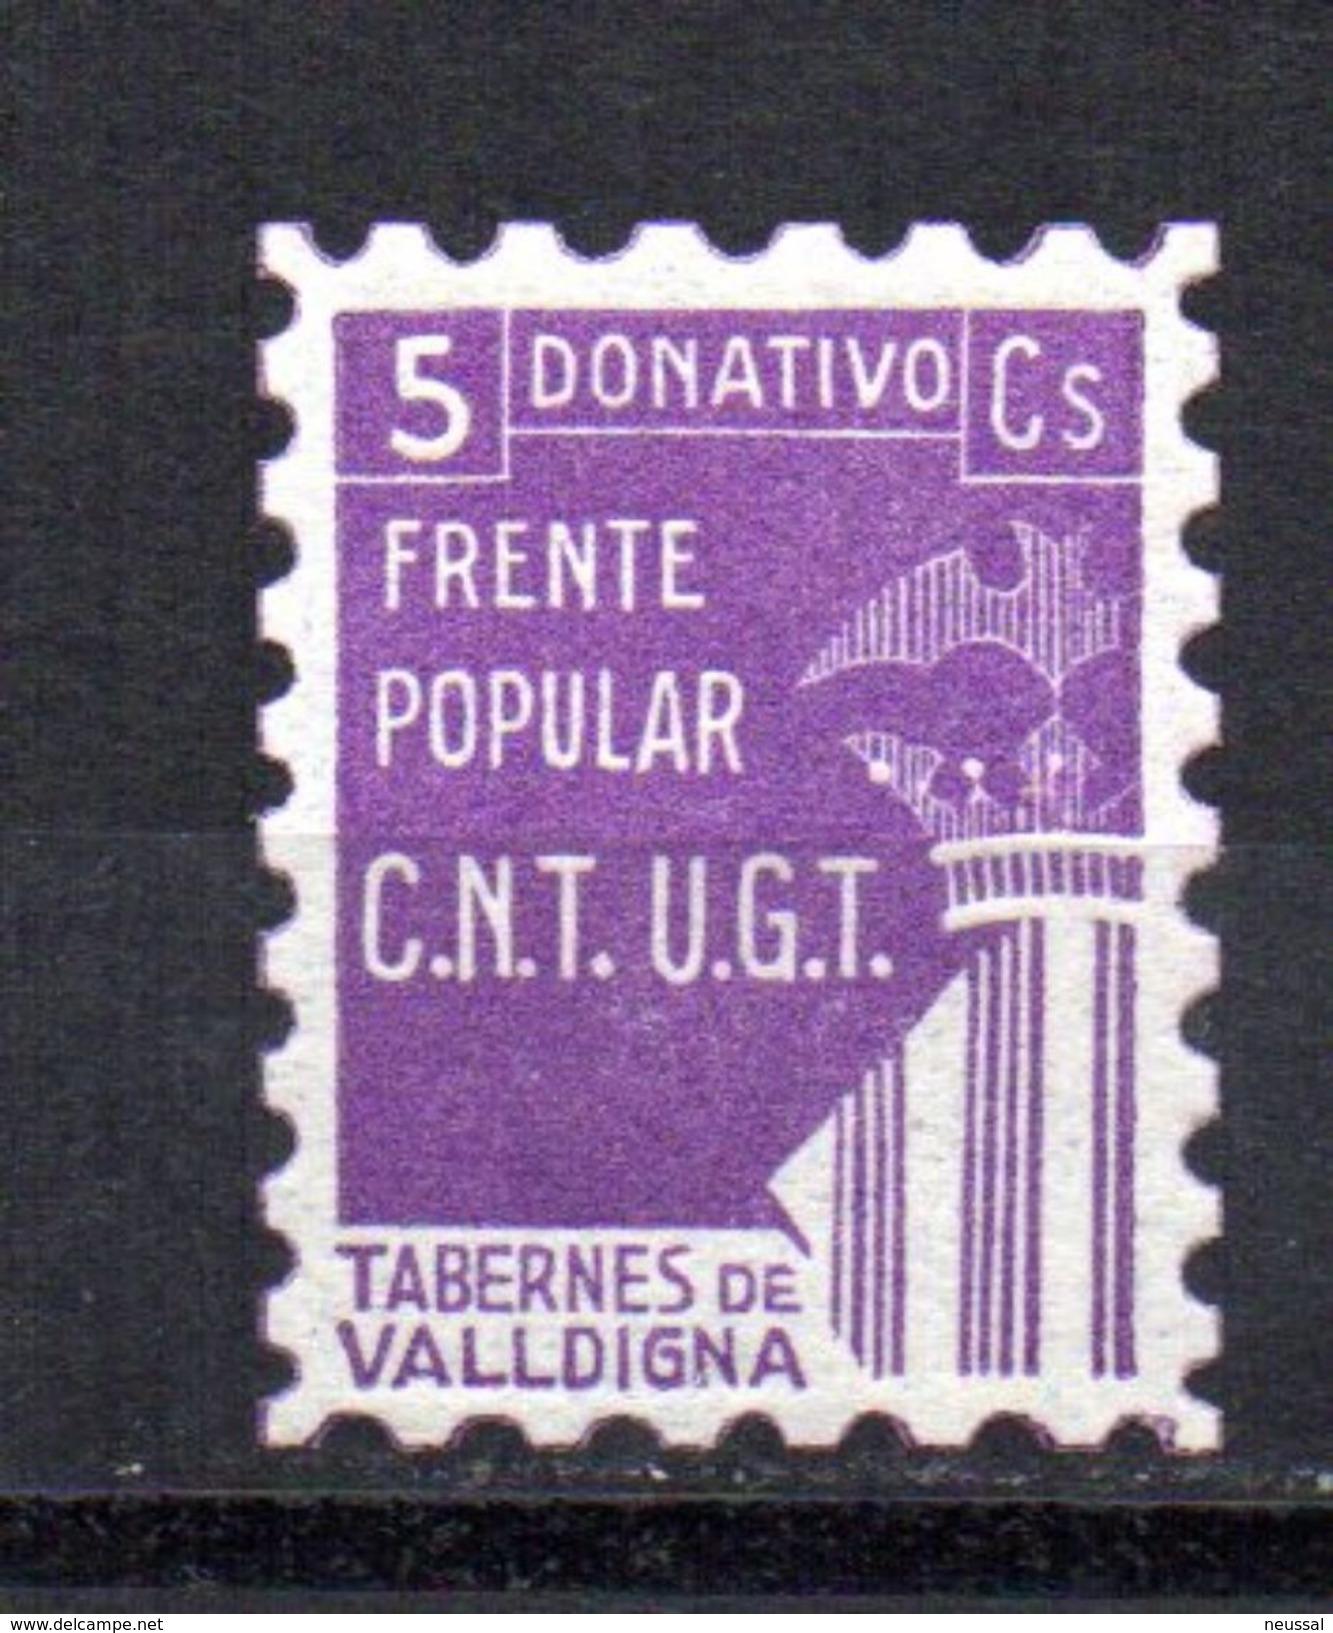 Viñeta  Nº 1   Frente Popular Tabernes De Valldigna. - Vignettes De La Guerre Civile